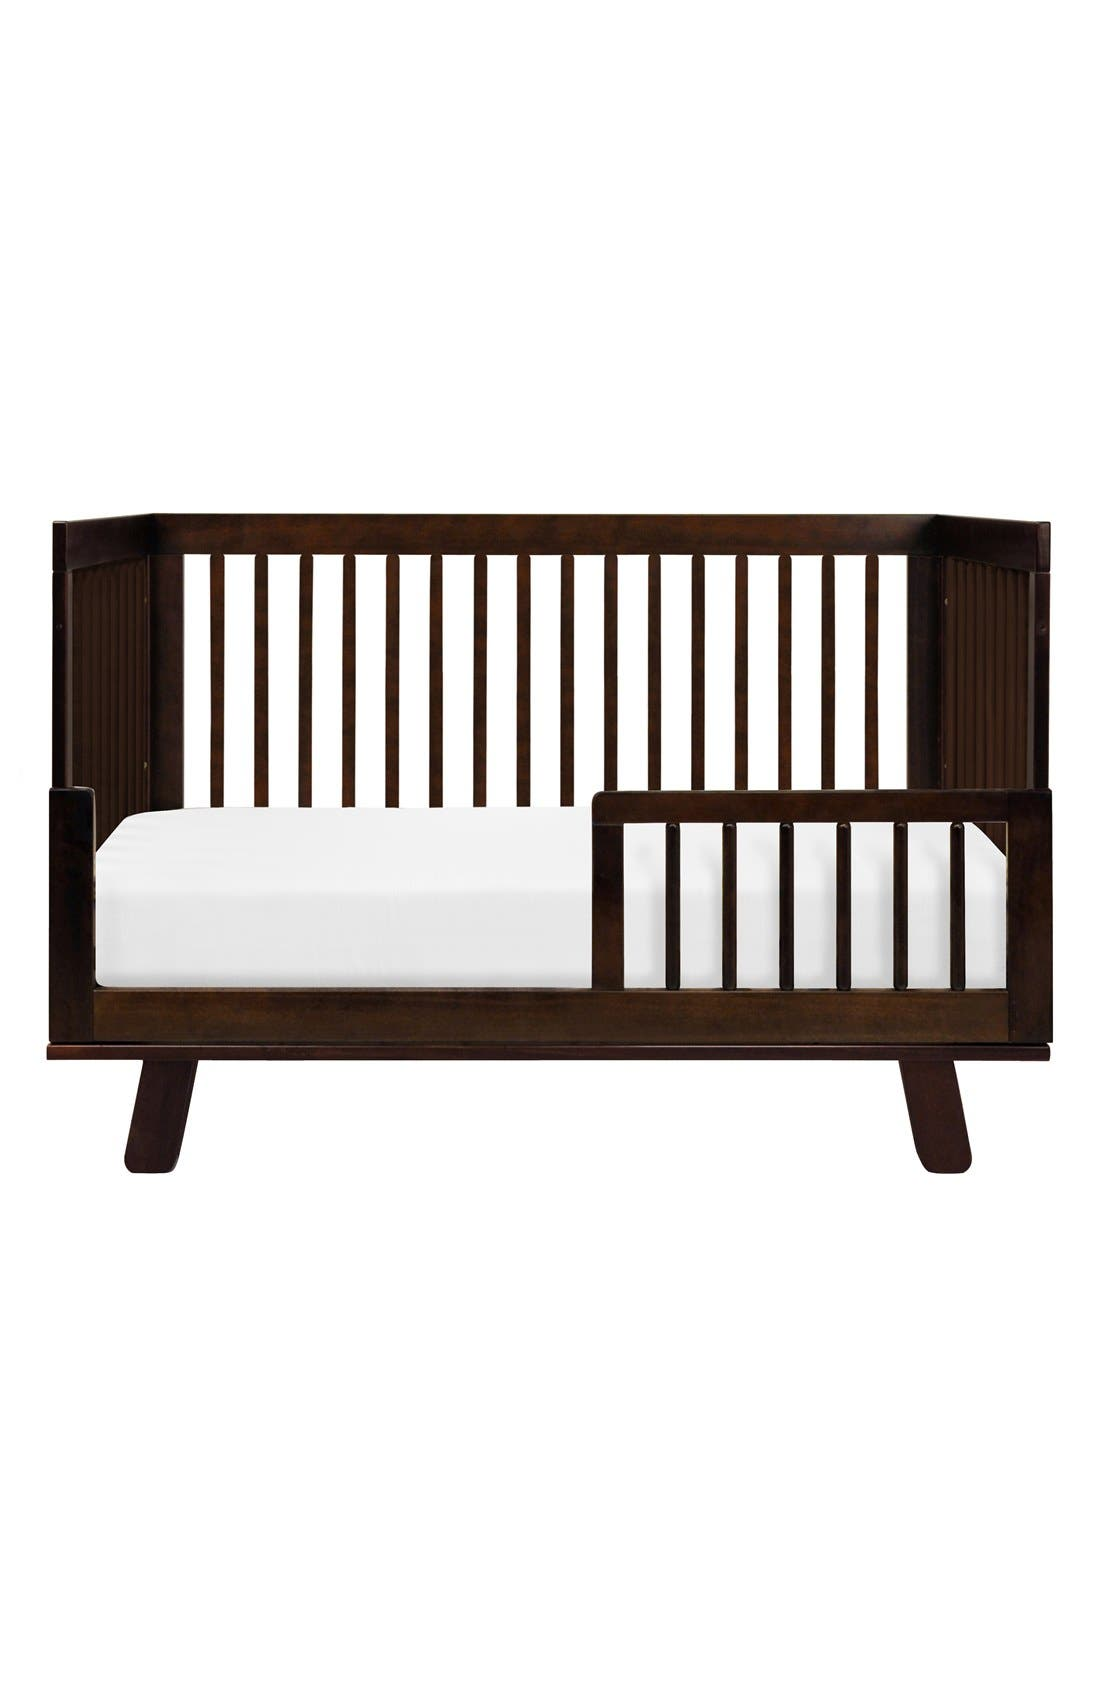 'Hudson' 3-in-1 Convertible Crib,                             Alternate thumbnail 12, color,